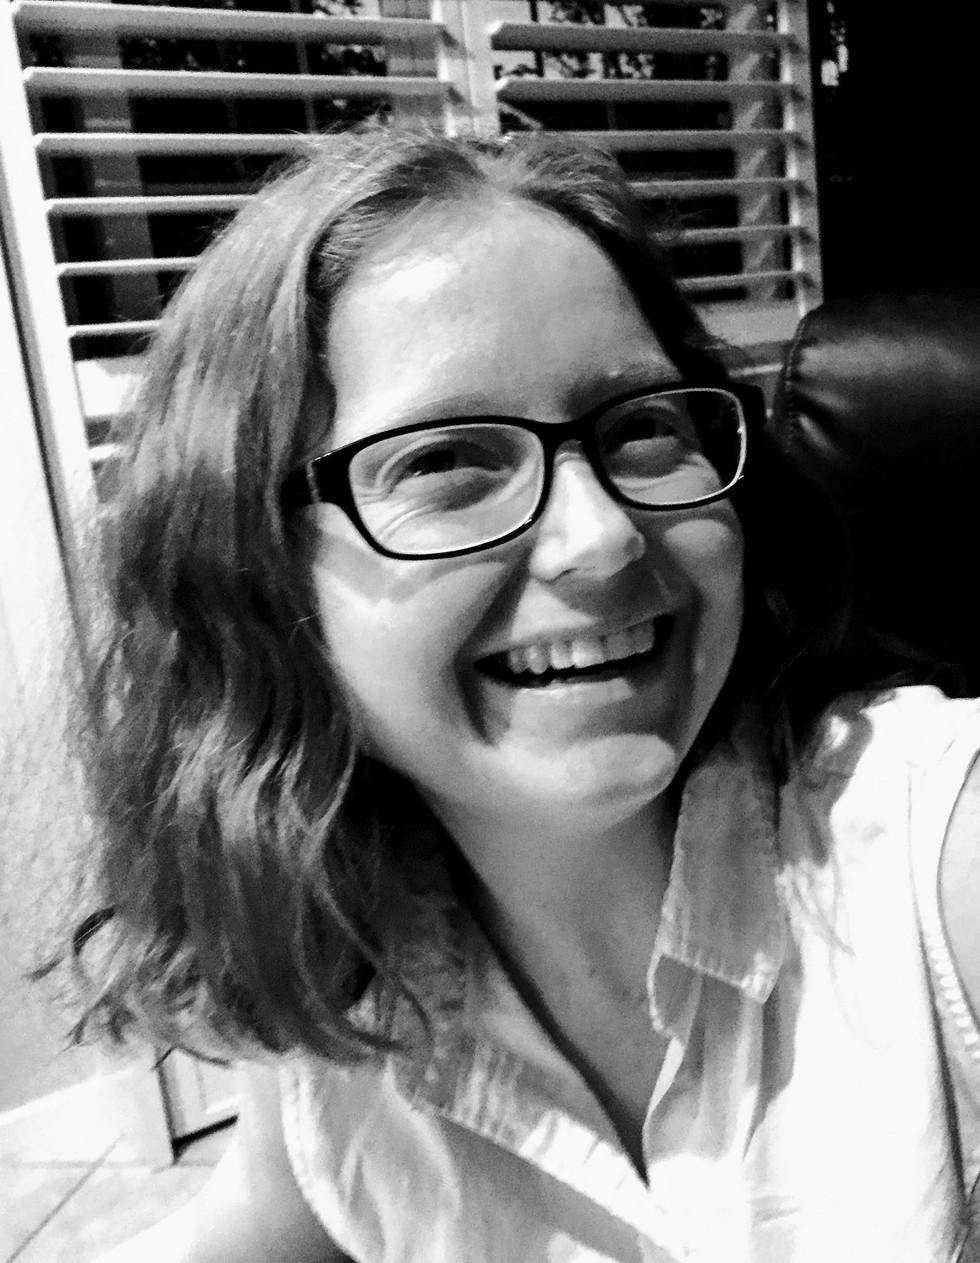 Author & Champion Spotlight: Kaitlyn Sanchez